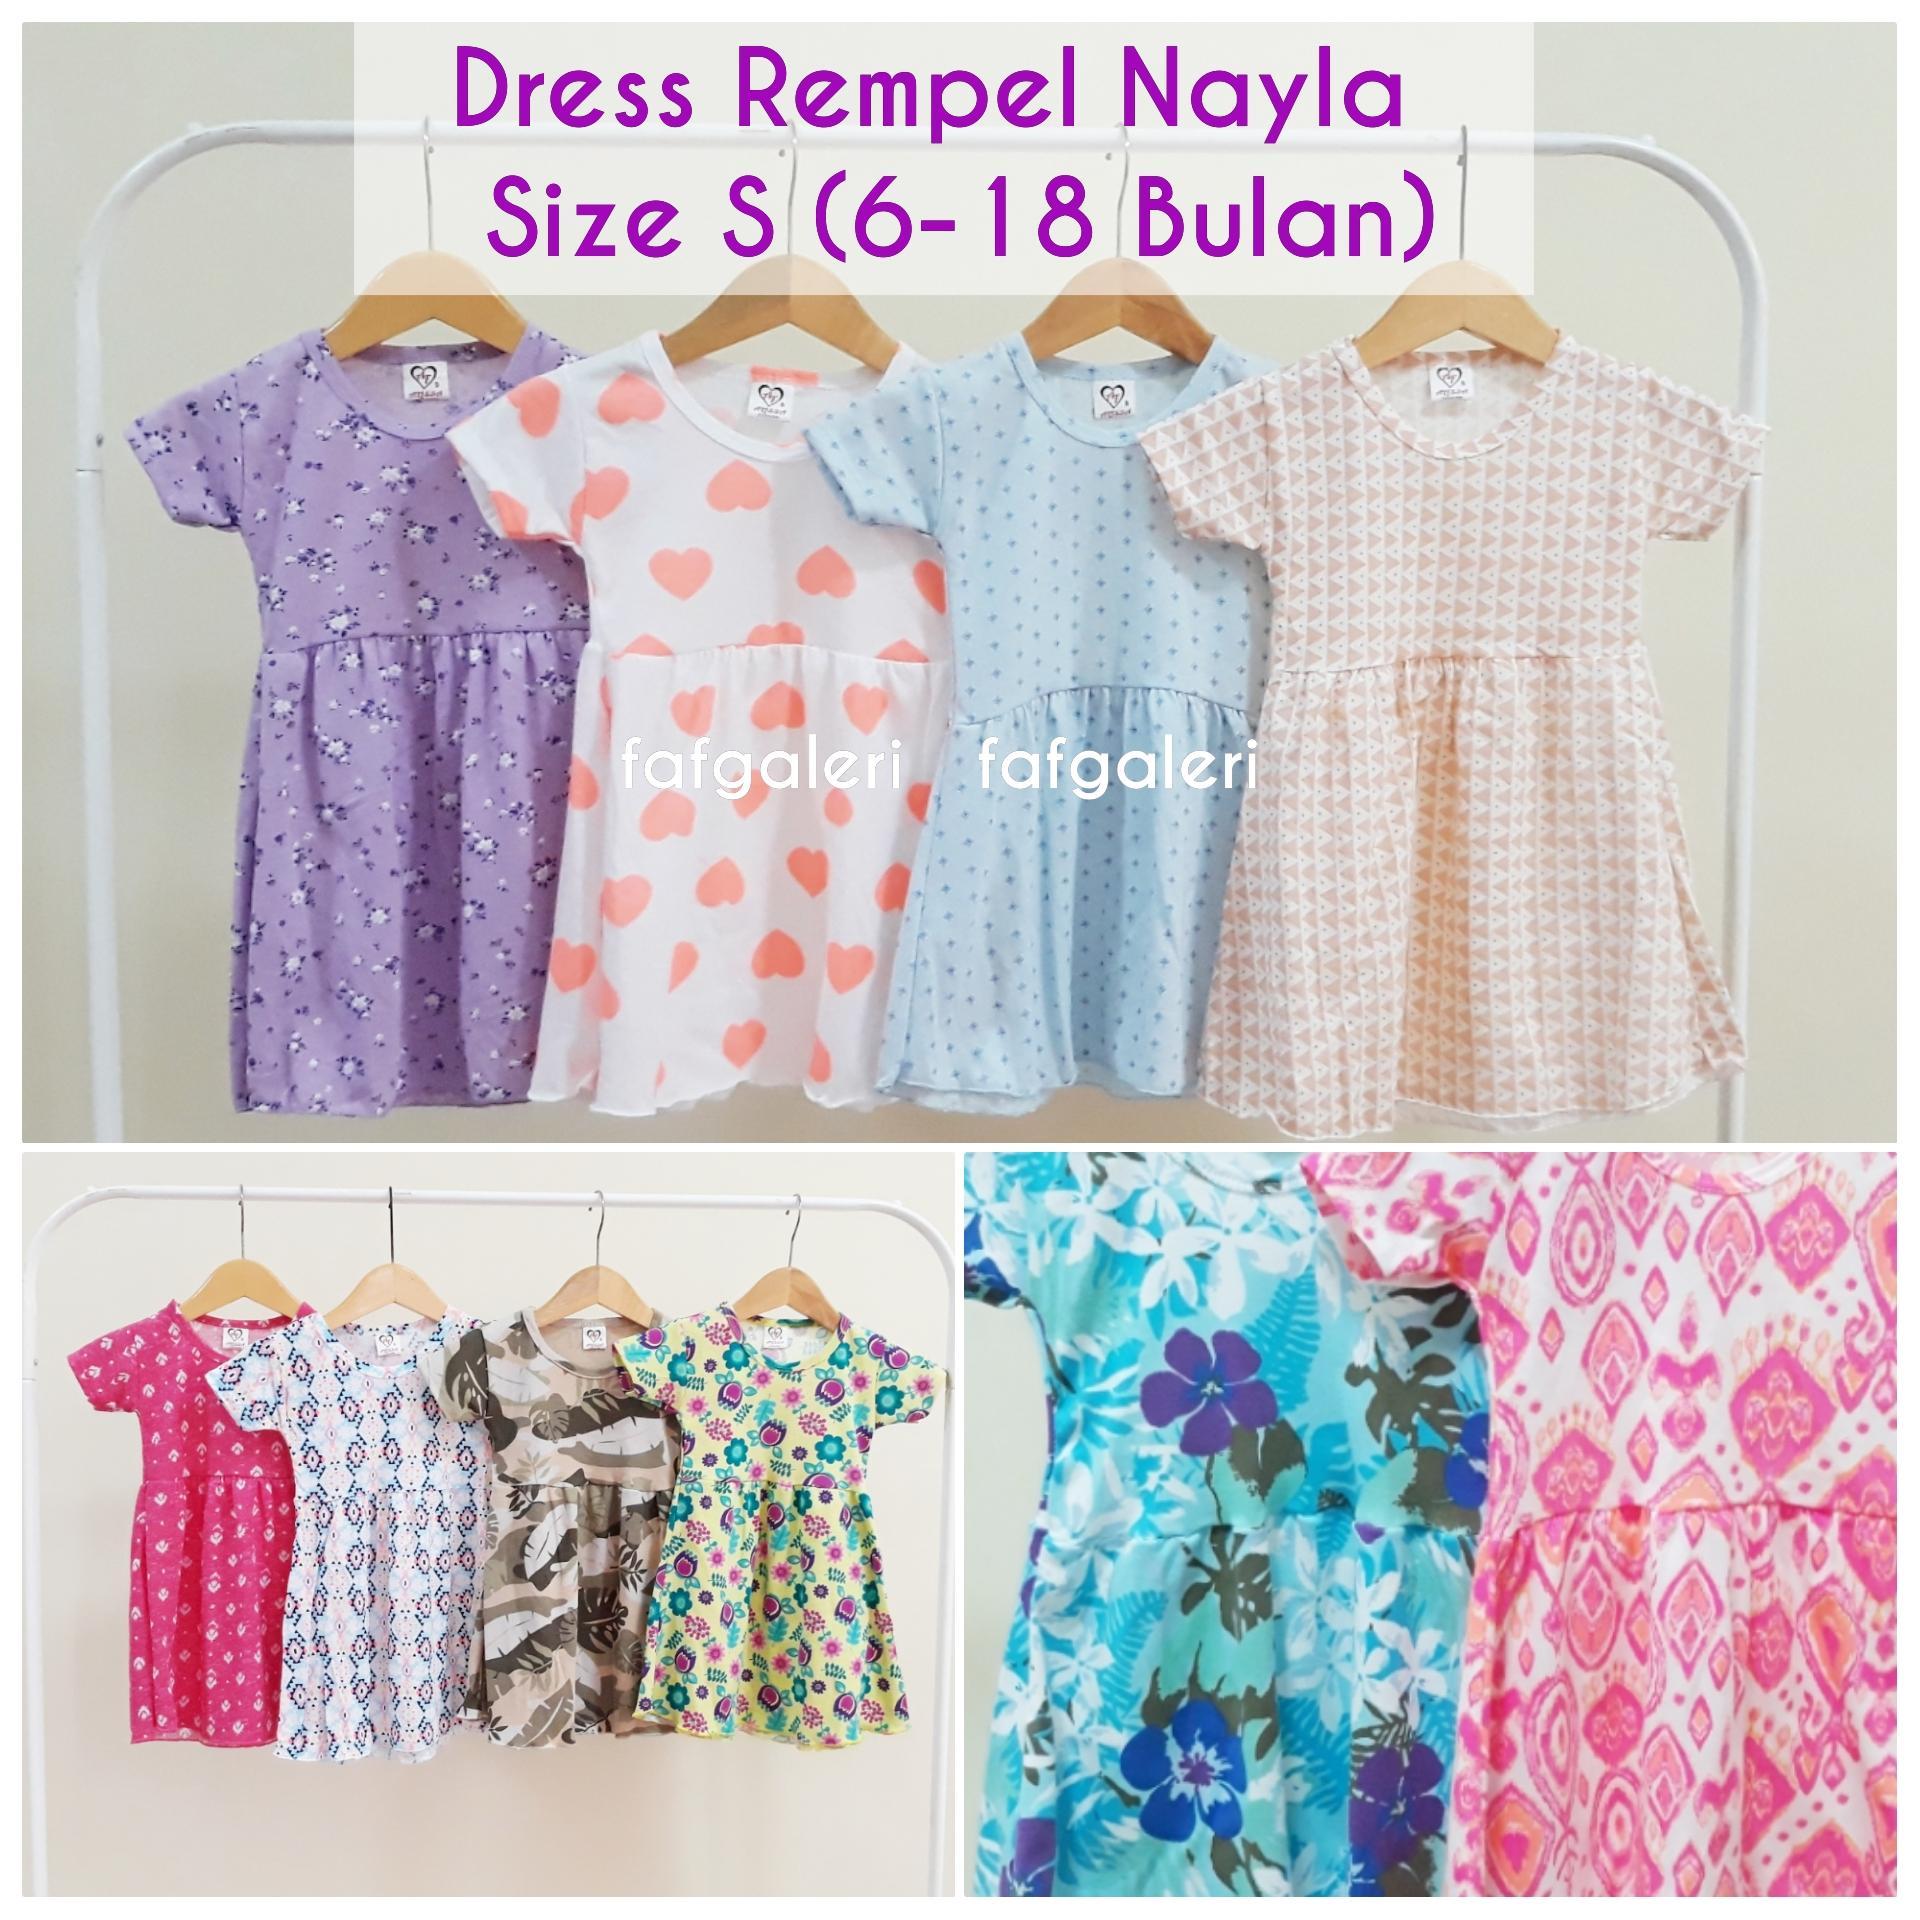 Dress Rempel Nayla 6-18 Bulan Lengan Pendek - Pakaian Baju Anak Bayi  Perempuan Bahan 2dc69bfe2d